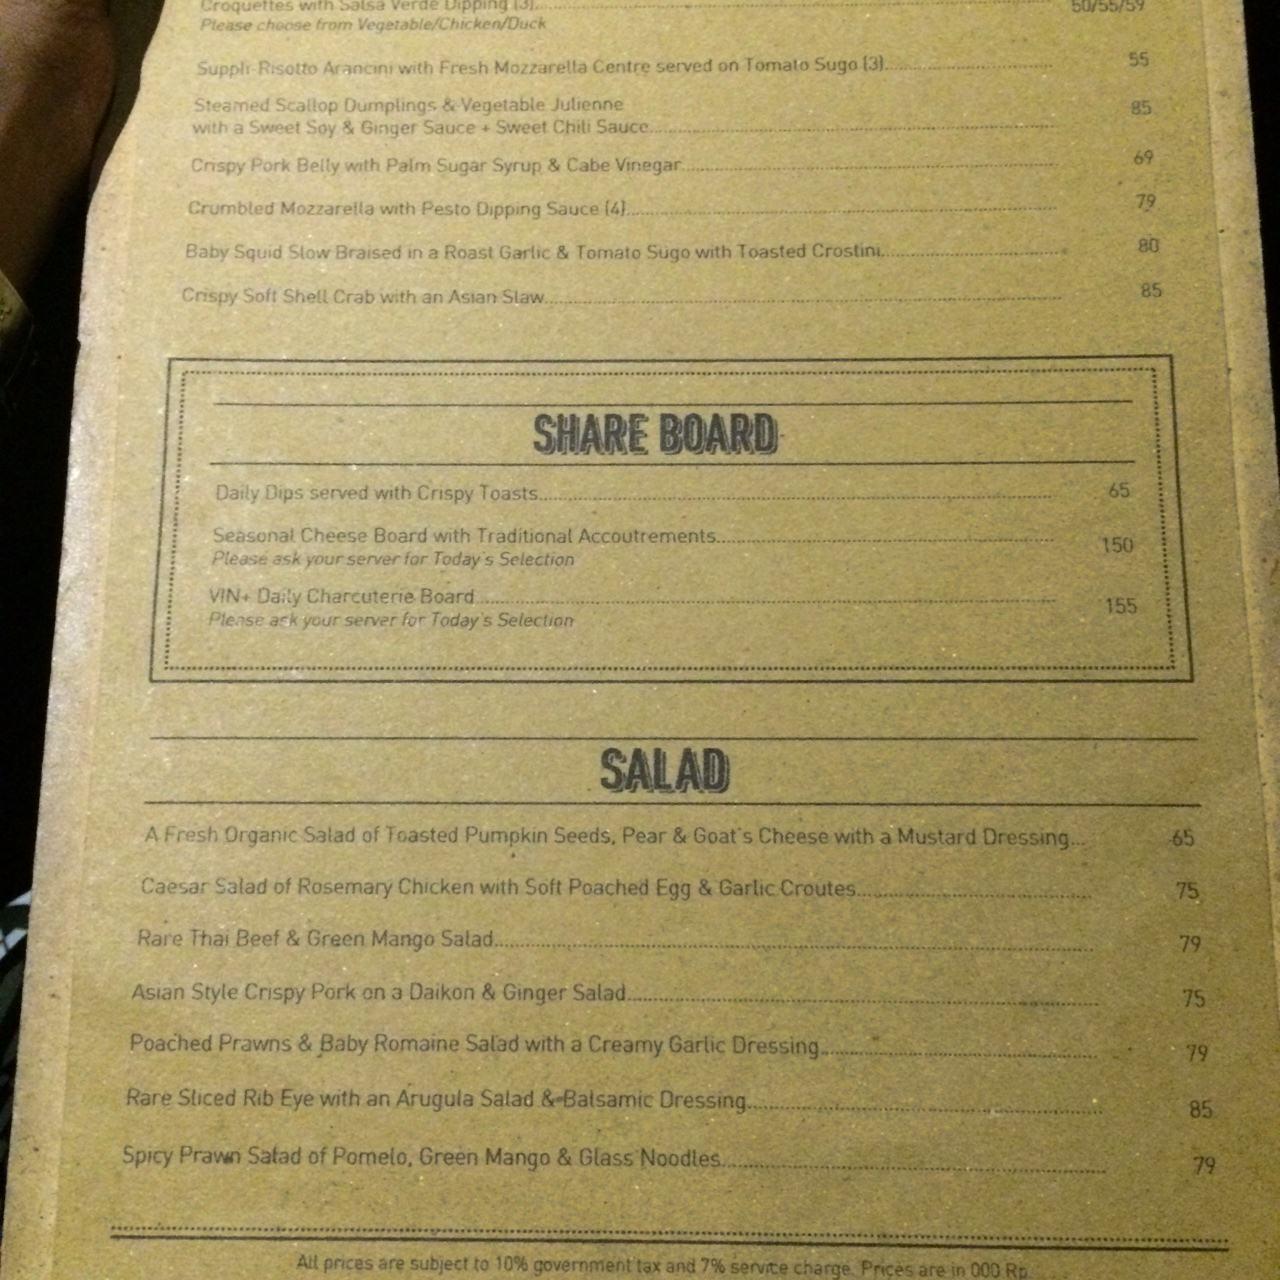 Menu Vin Seminyak Bali Best Restaurants Cafe In Bali Guide